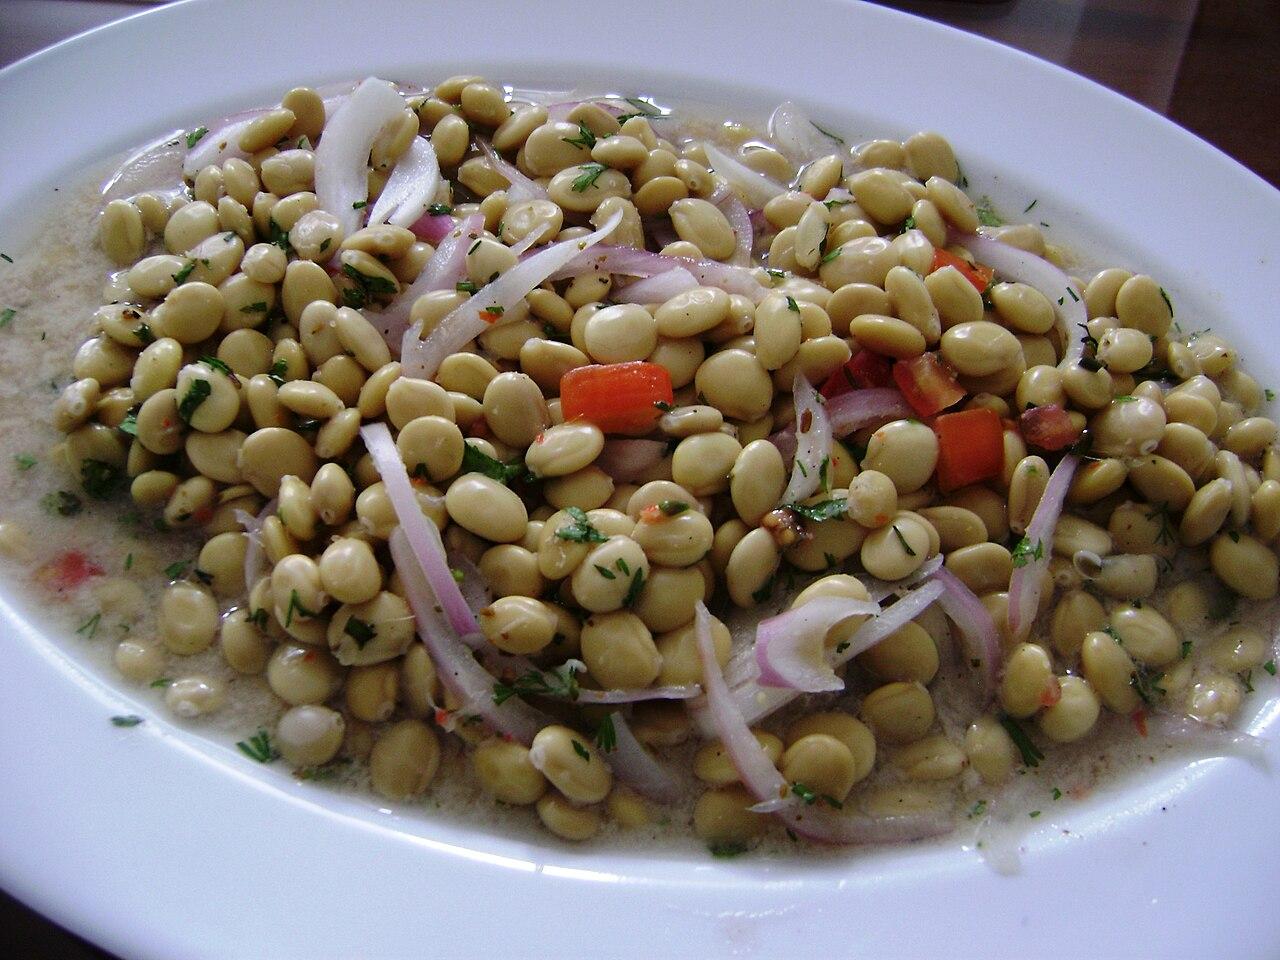 Archivo:Ceviche de chochos Huari 09102009.JPG